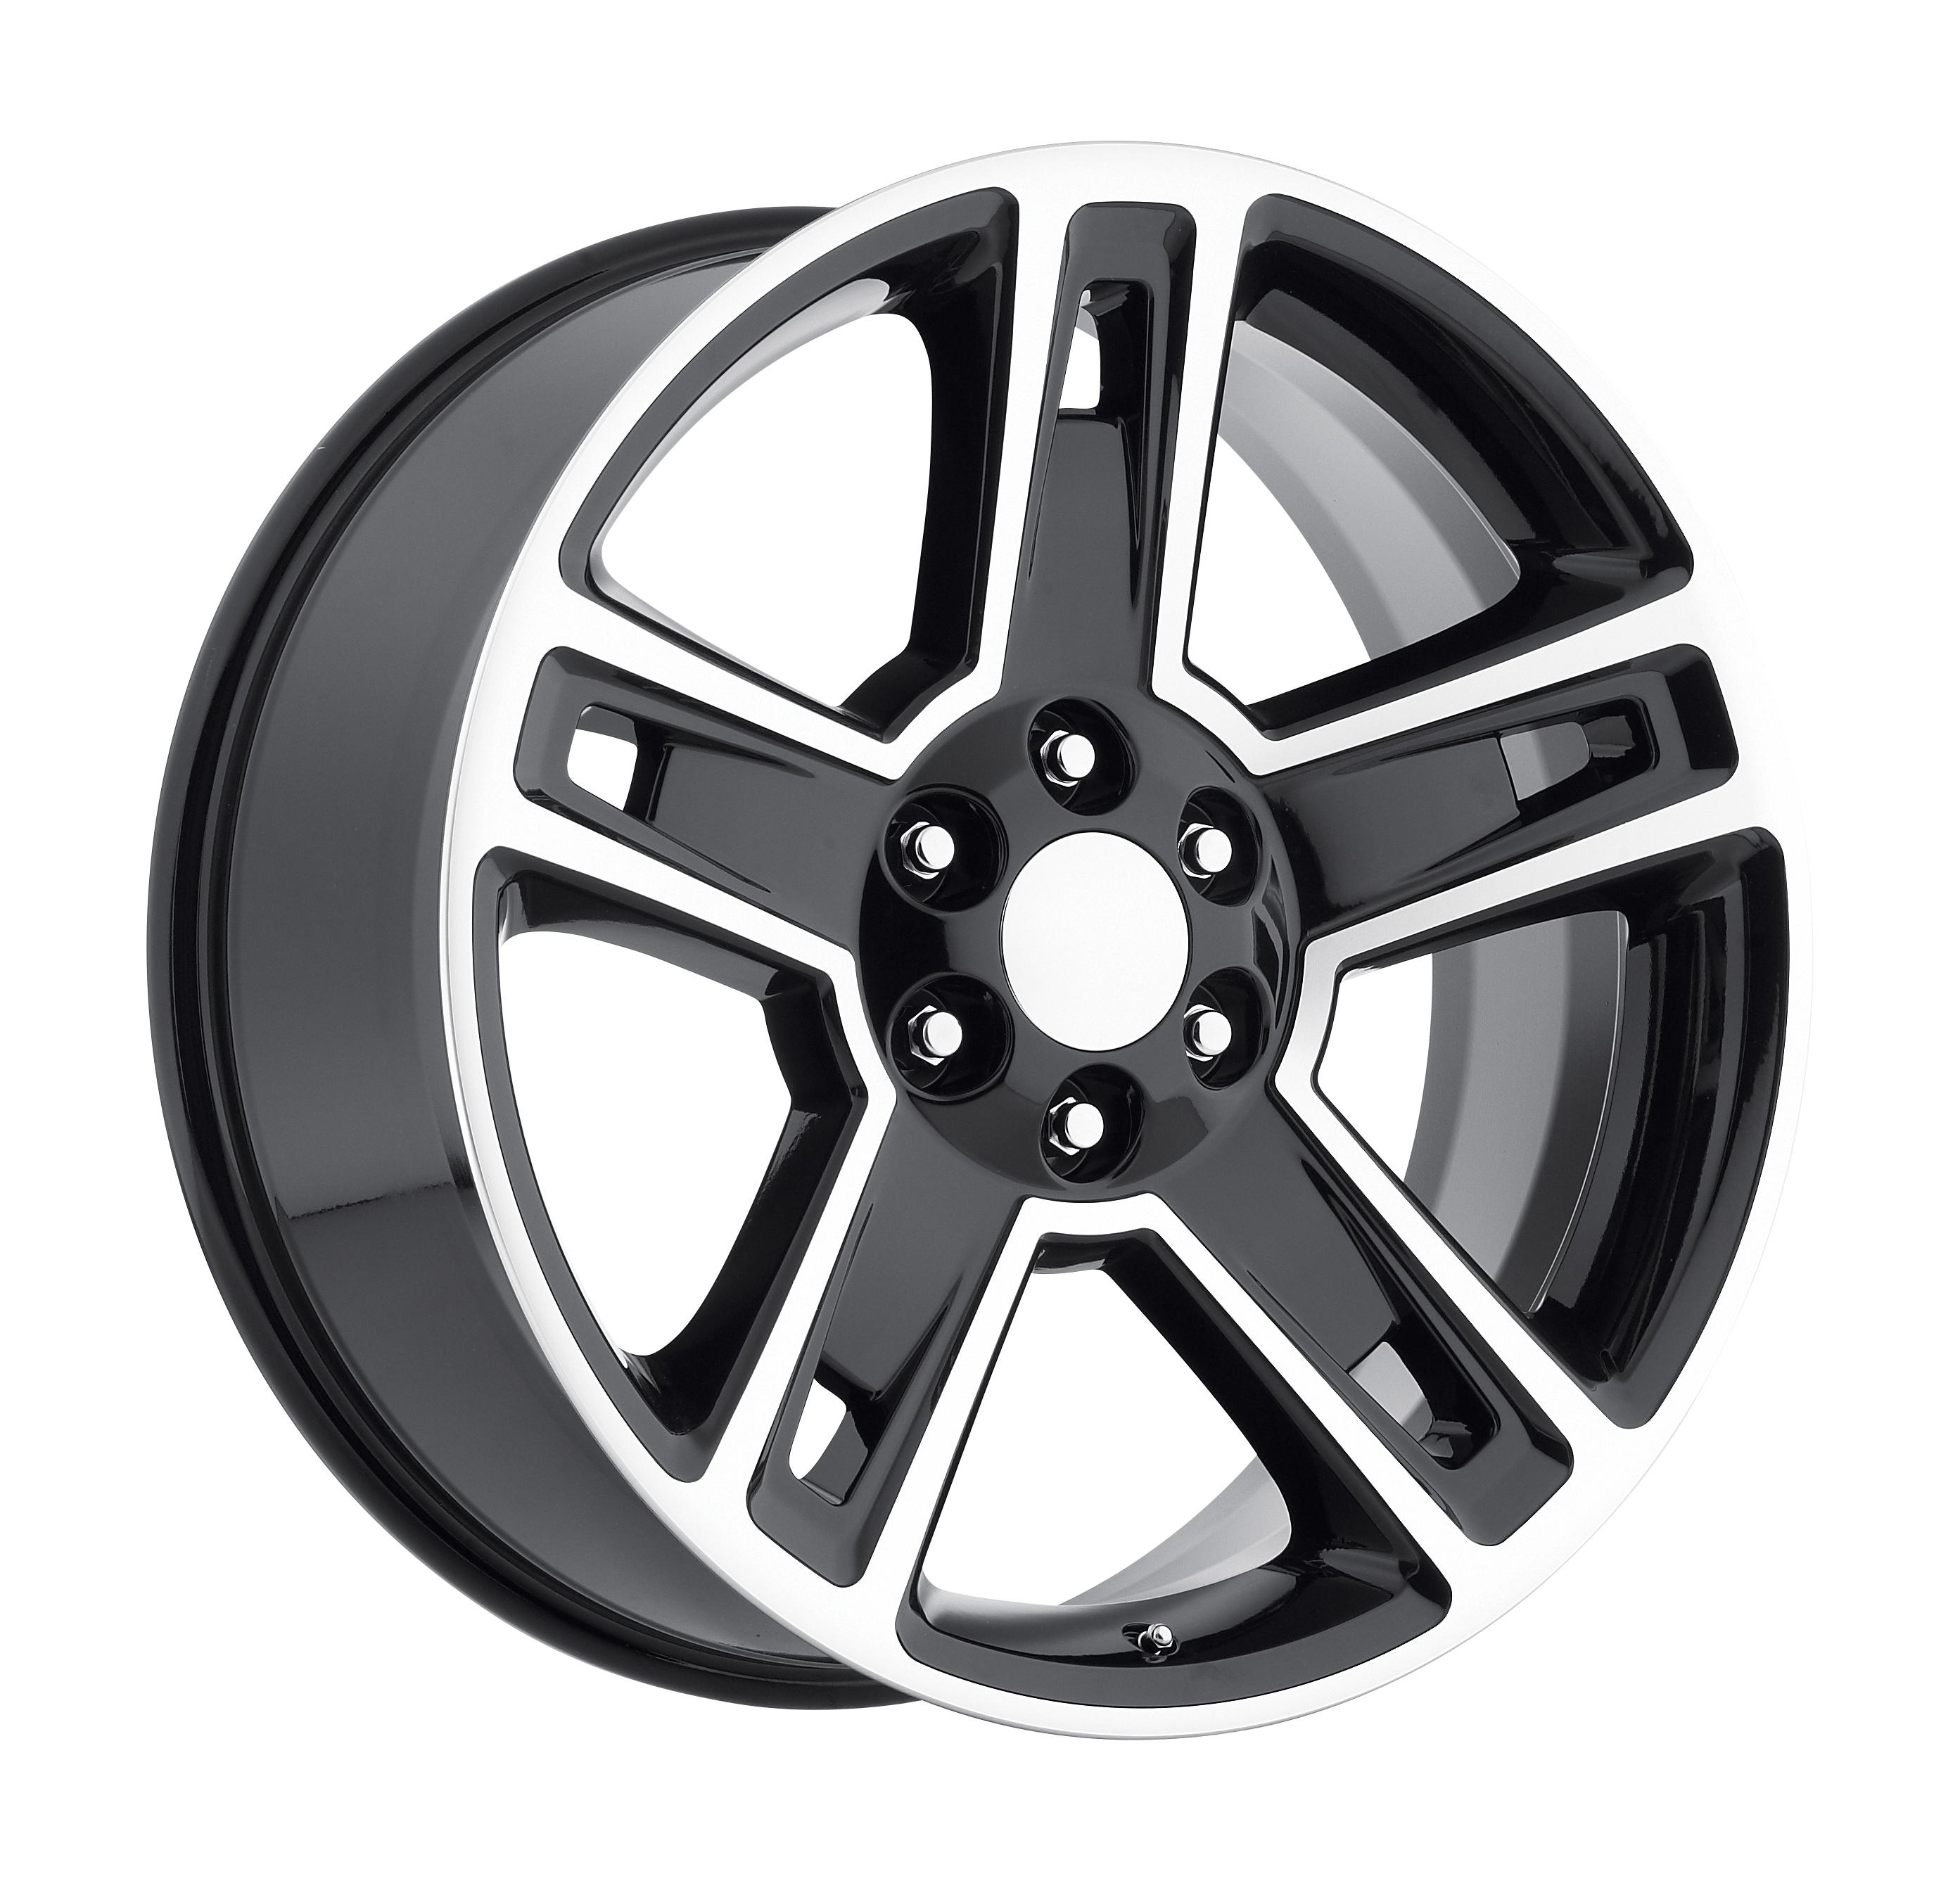 yukon gmc chrome escalade ltz pin tahoe chevrolet silverado chevy rims wheels sierra